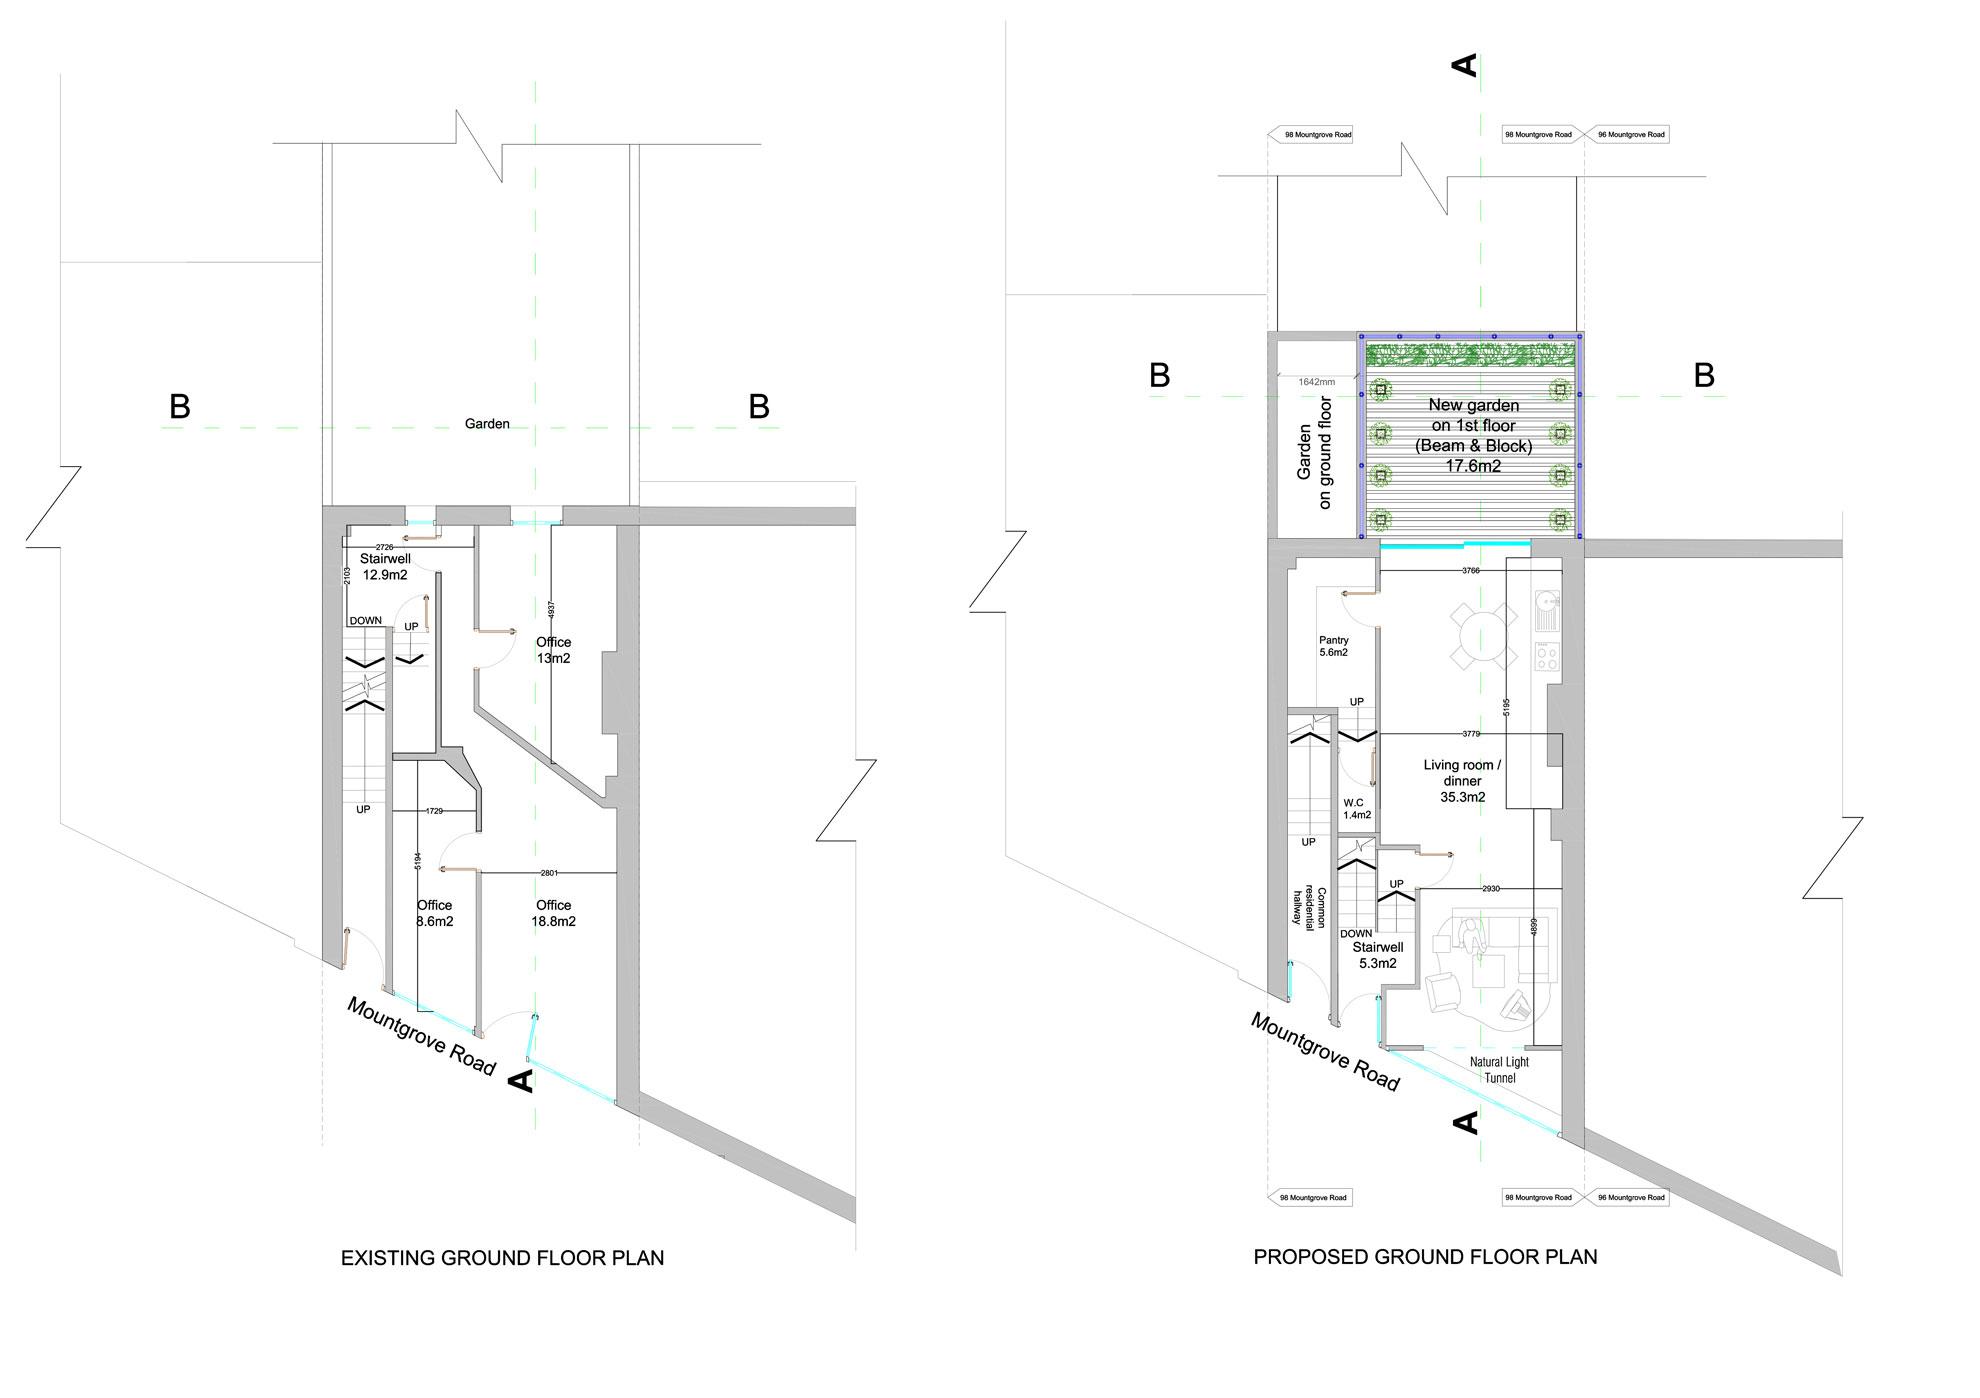 Basement-Extension-in-Islington-Ground-Floor-Plan